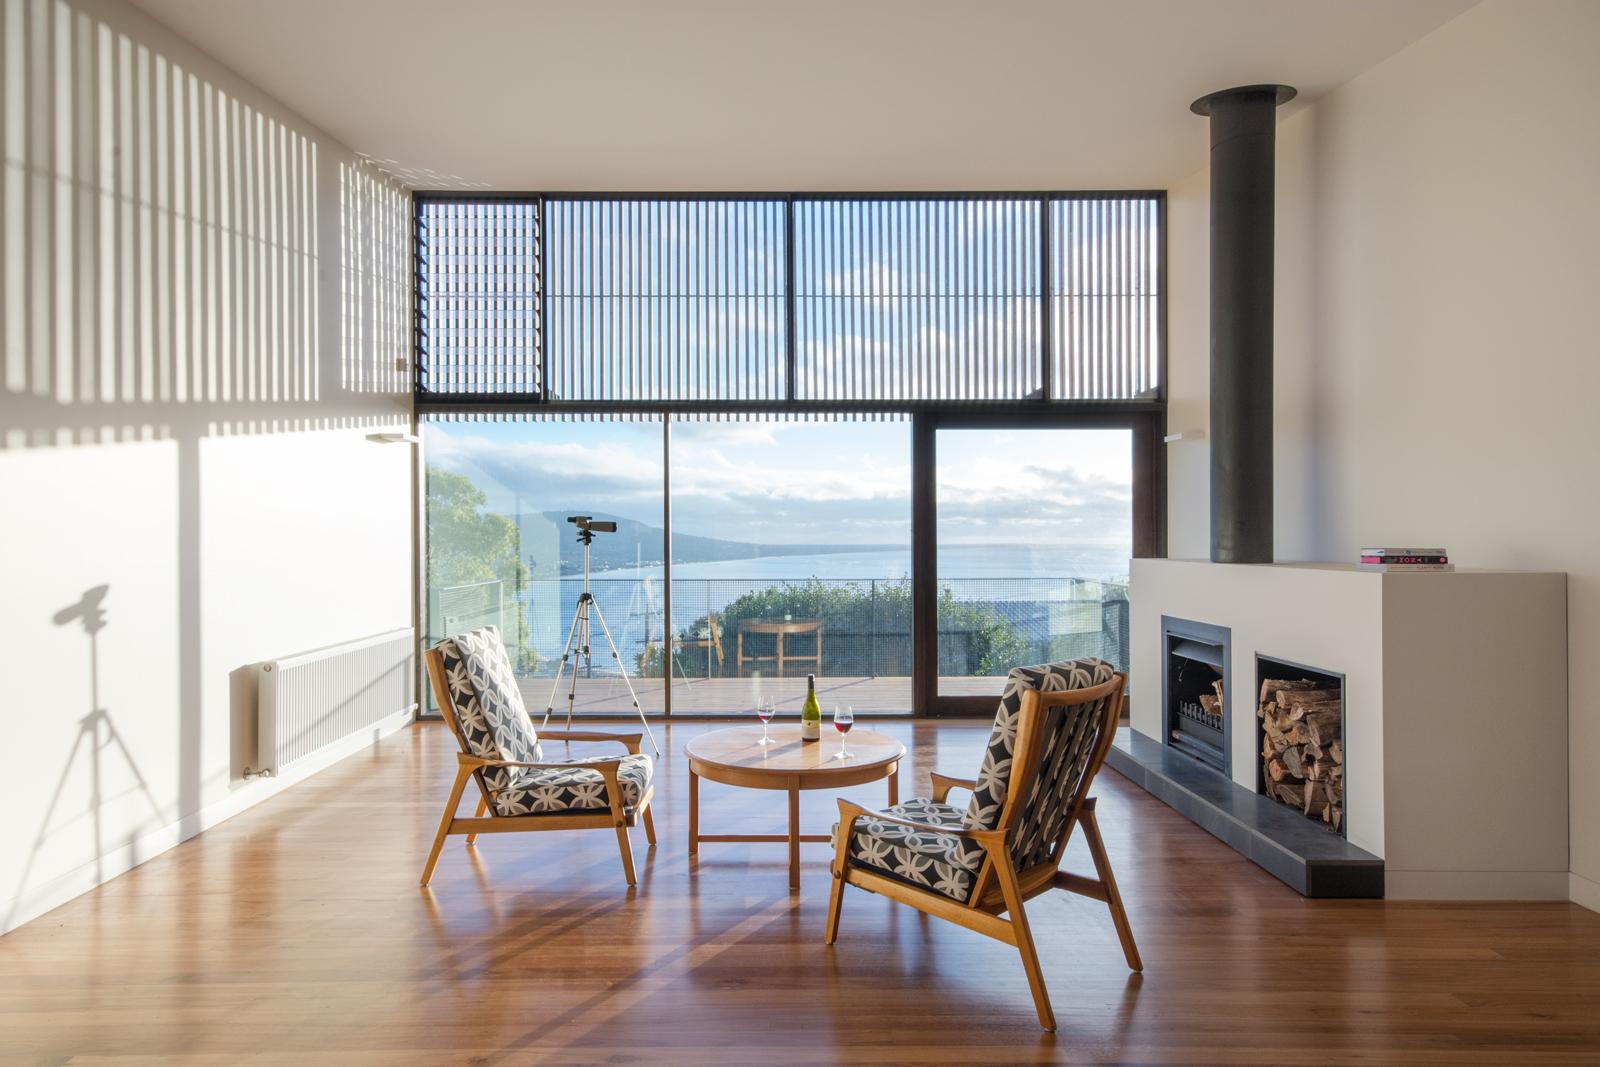 Living room with ocean views in Australian beach home by OLA Studio